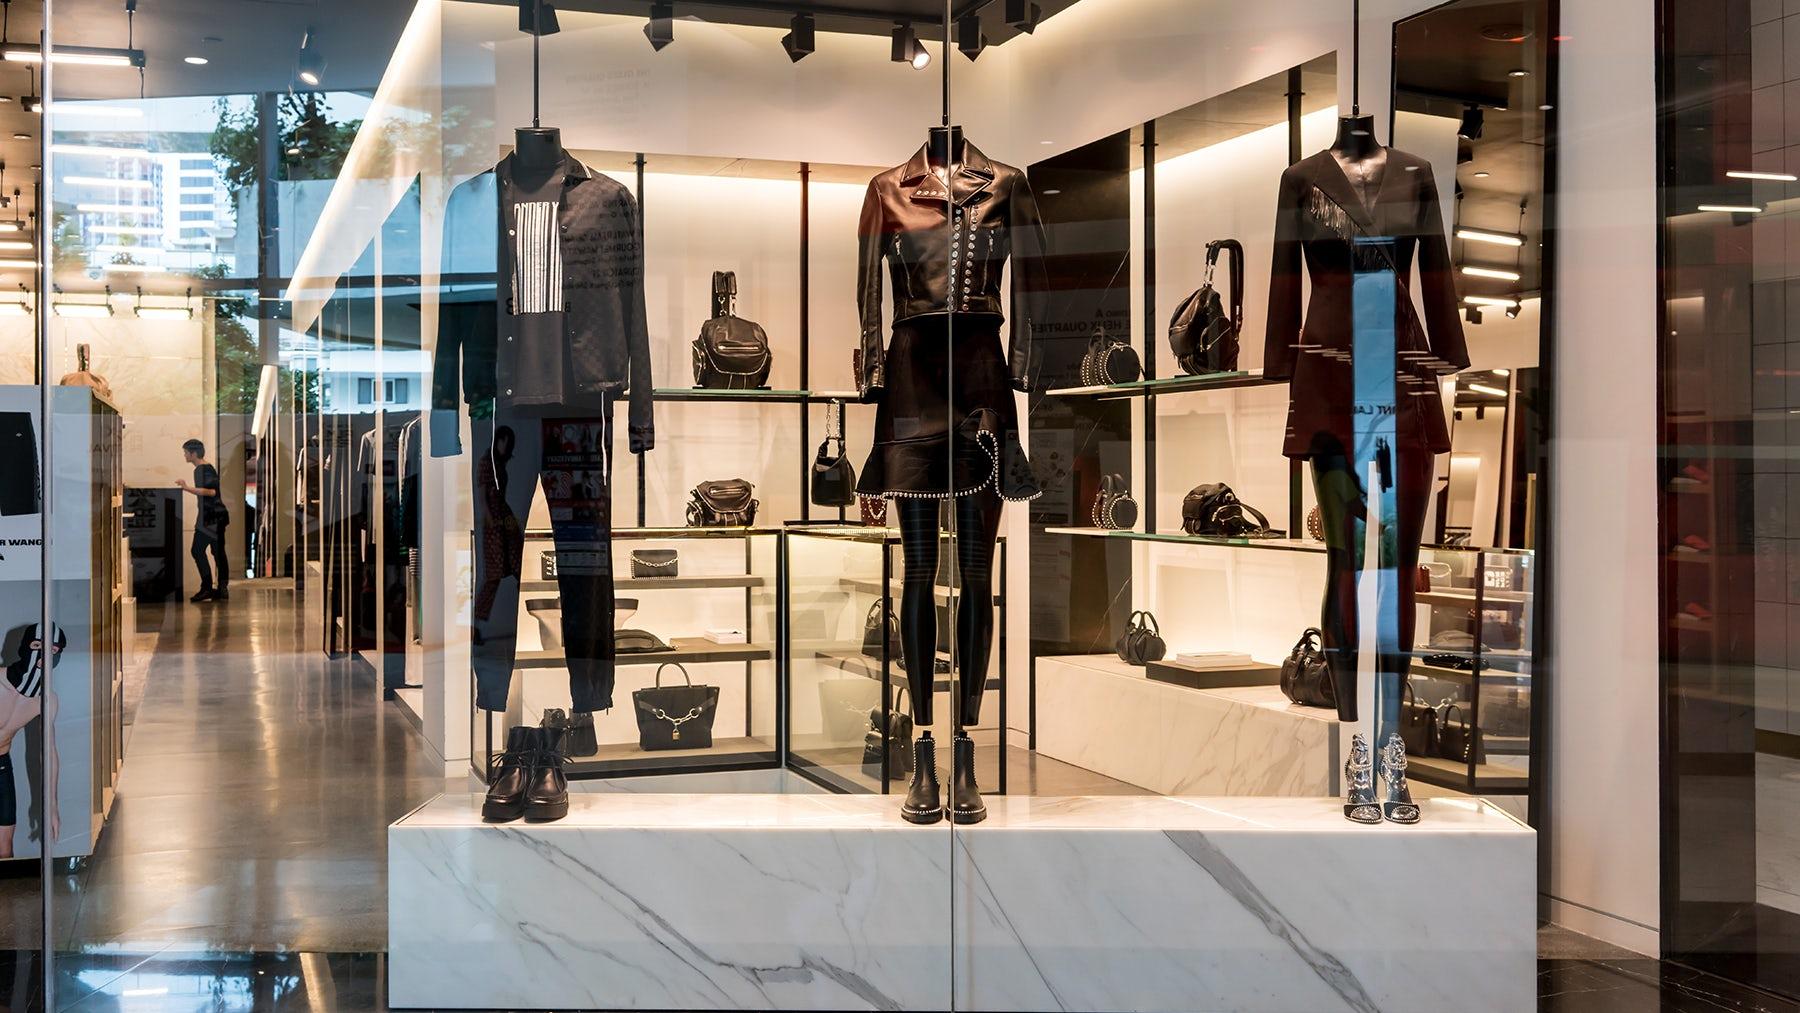 Alexander Wang's monochrome display in Bangkok   Source: Shutterstock